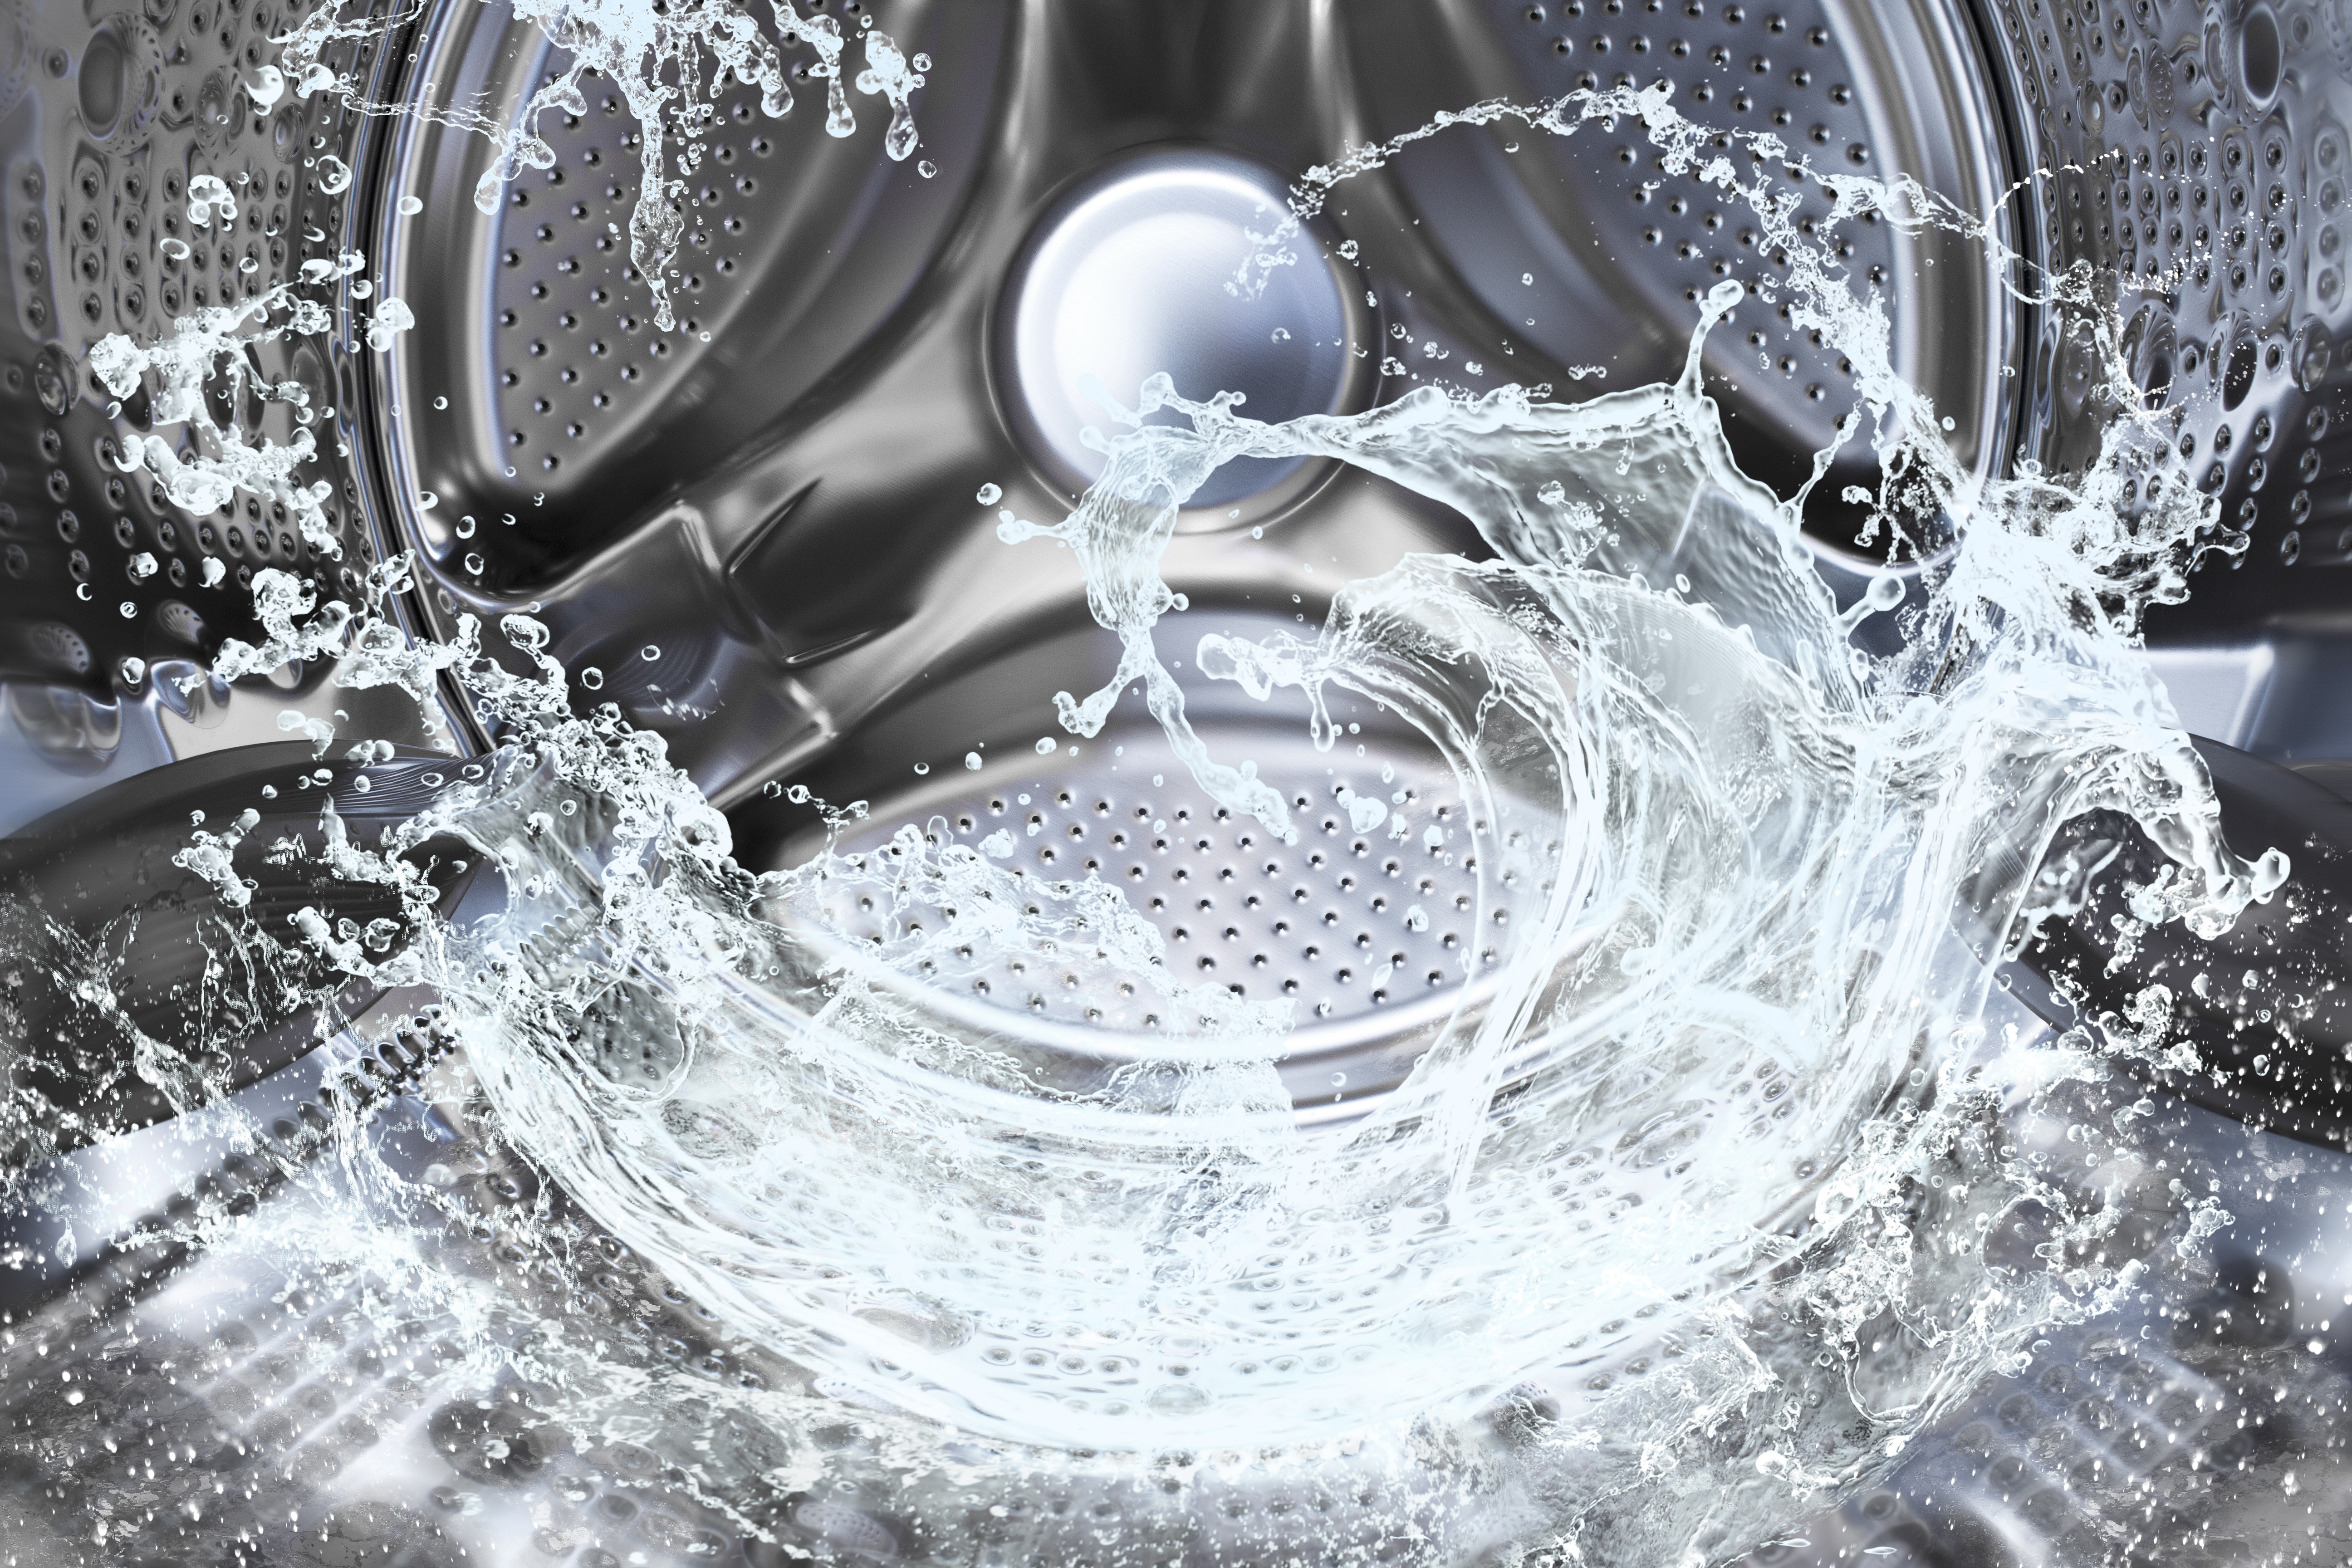 How to Clean a Washing Machine - Glotech Repairs